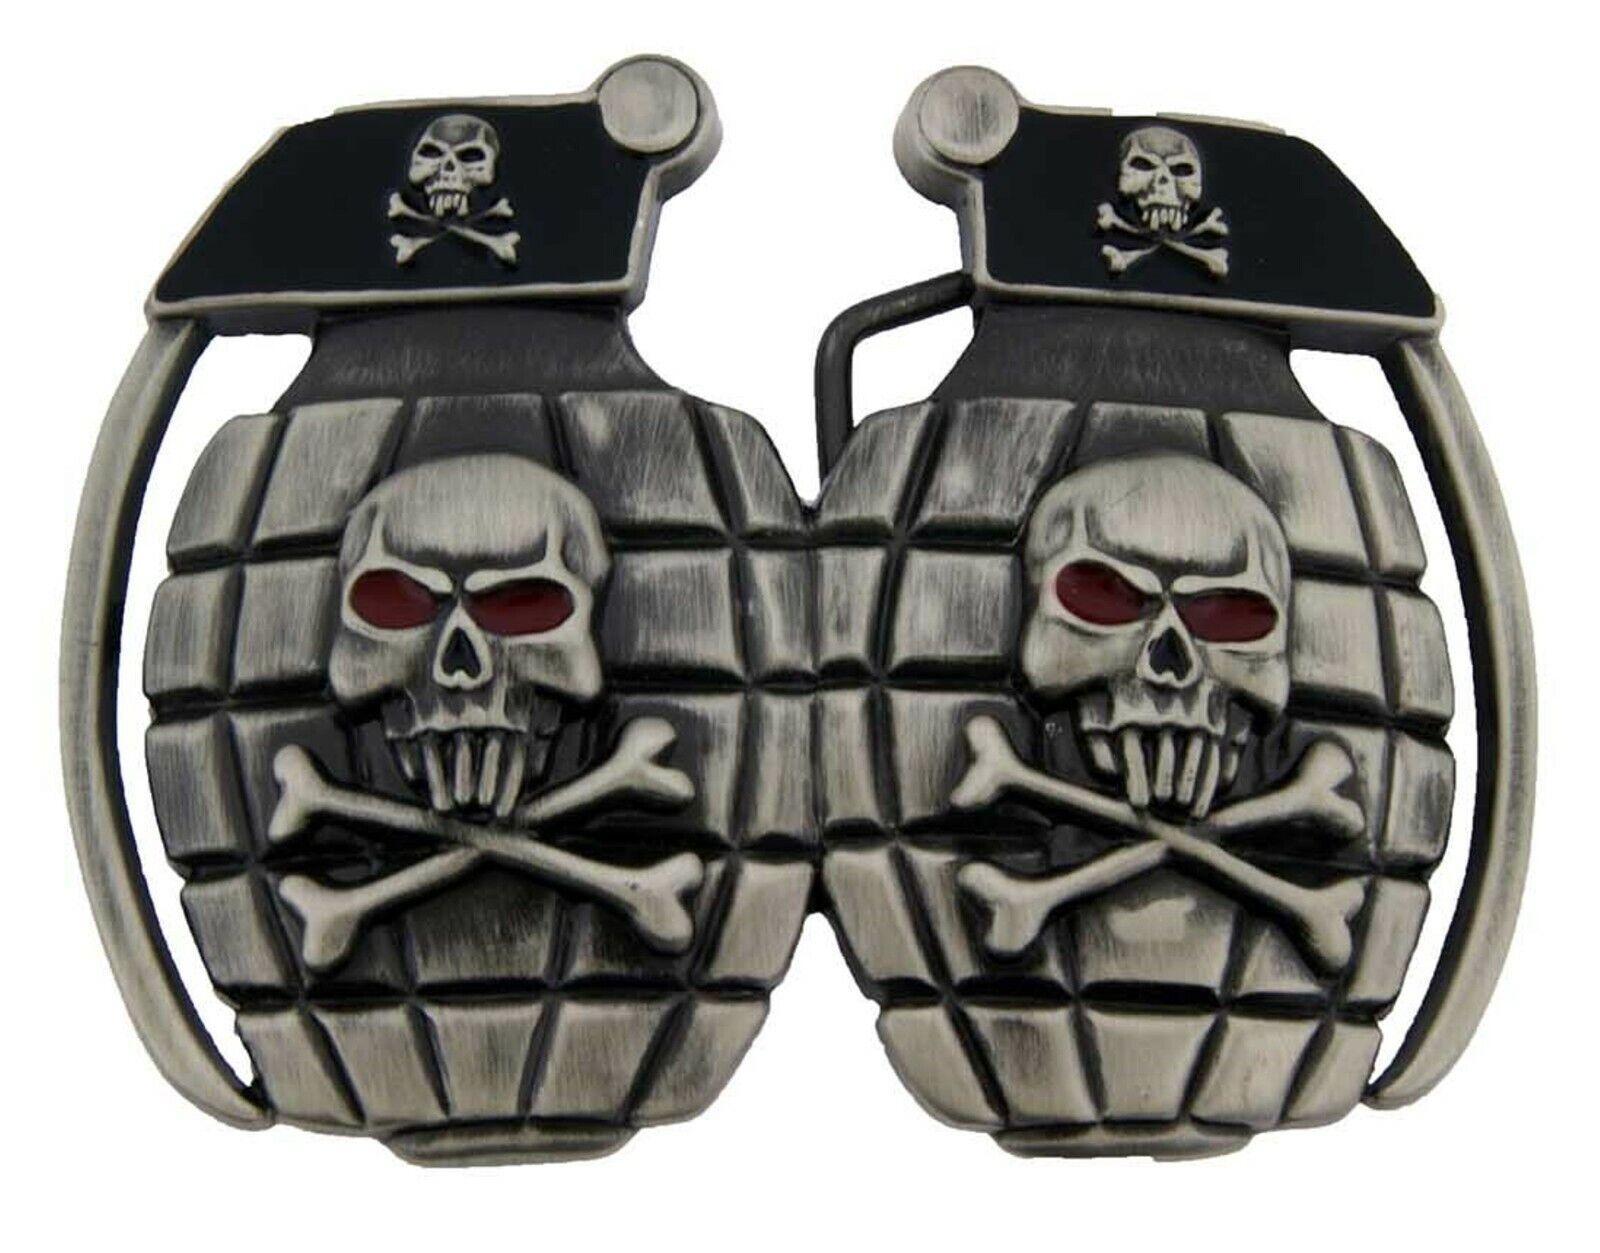 The Grenade Belt Buckle Skull Skeleton Tattoo US Army Soldier Device Explosive